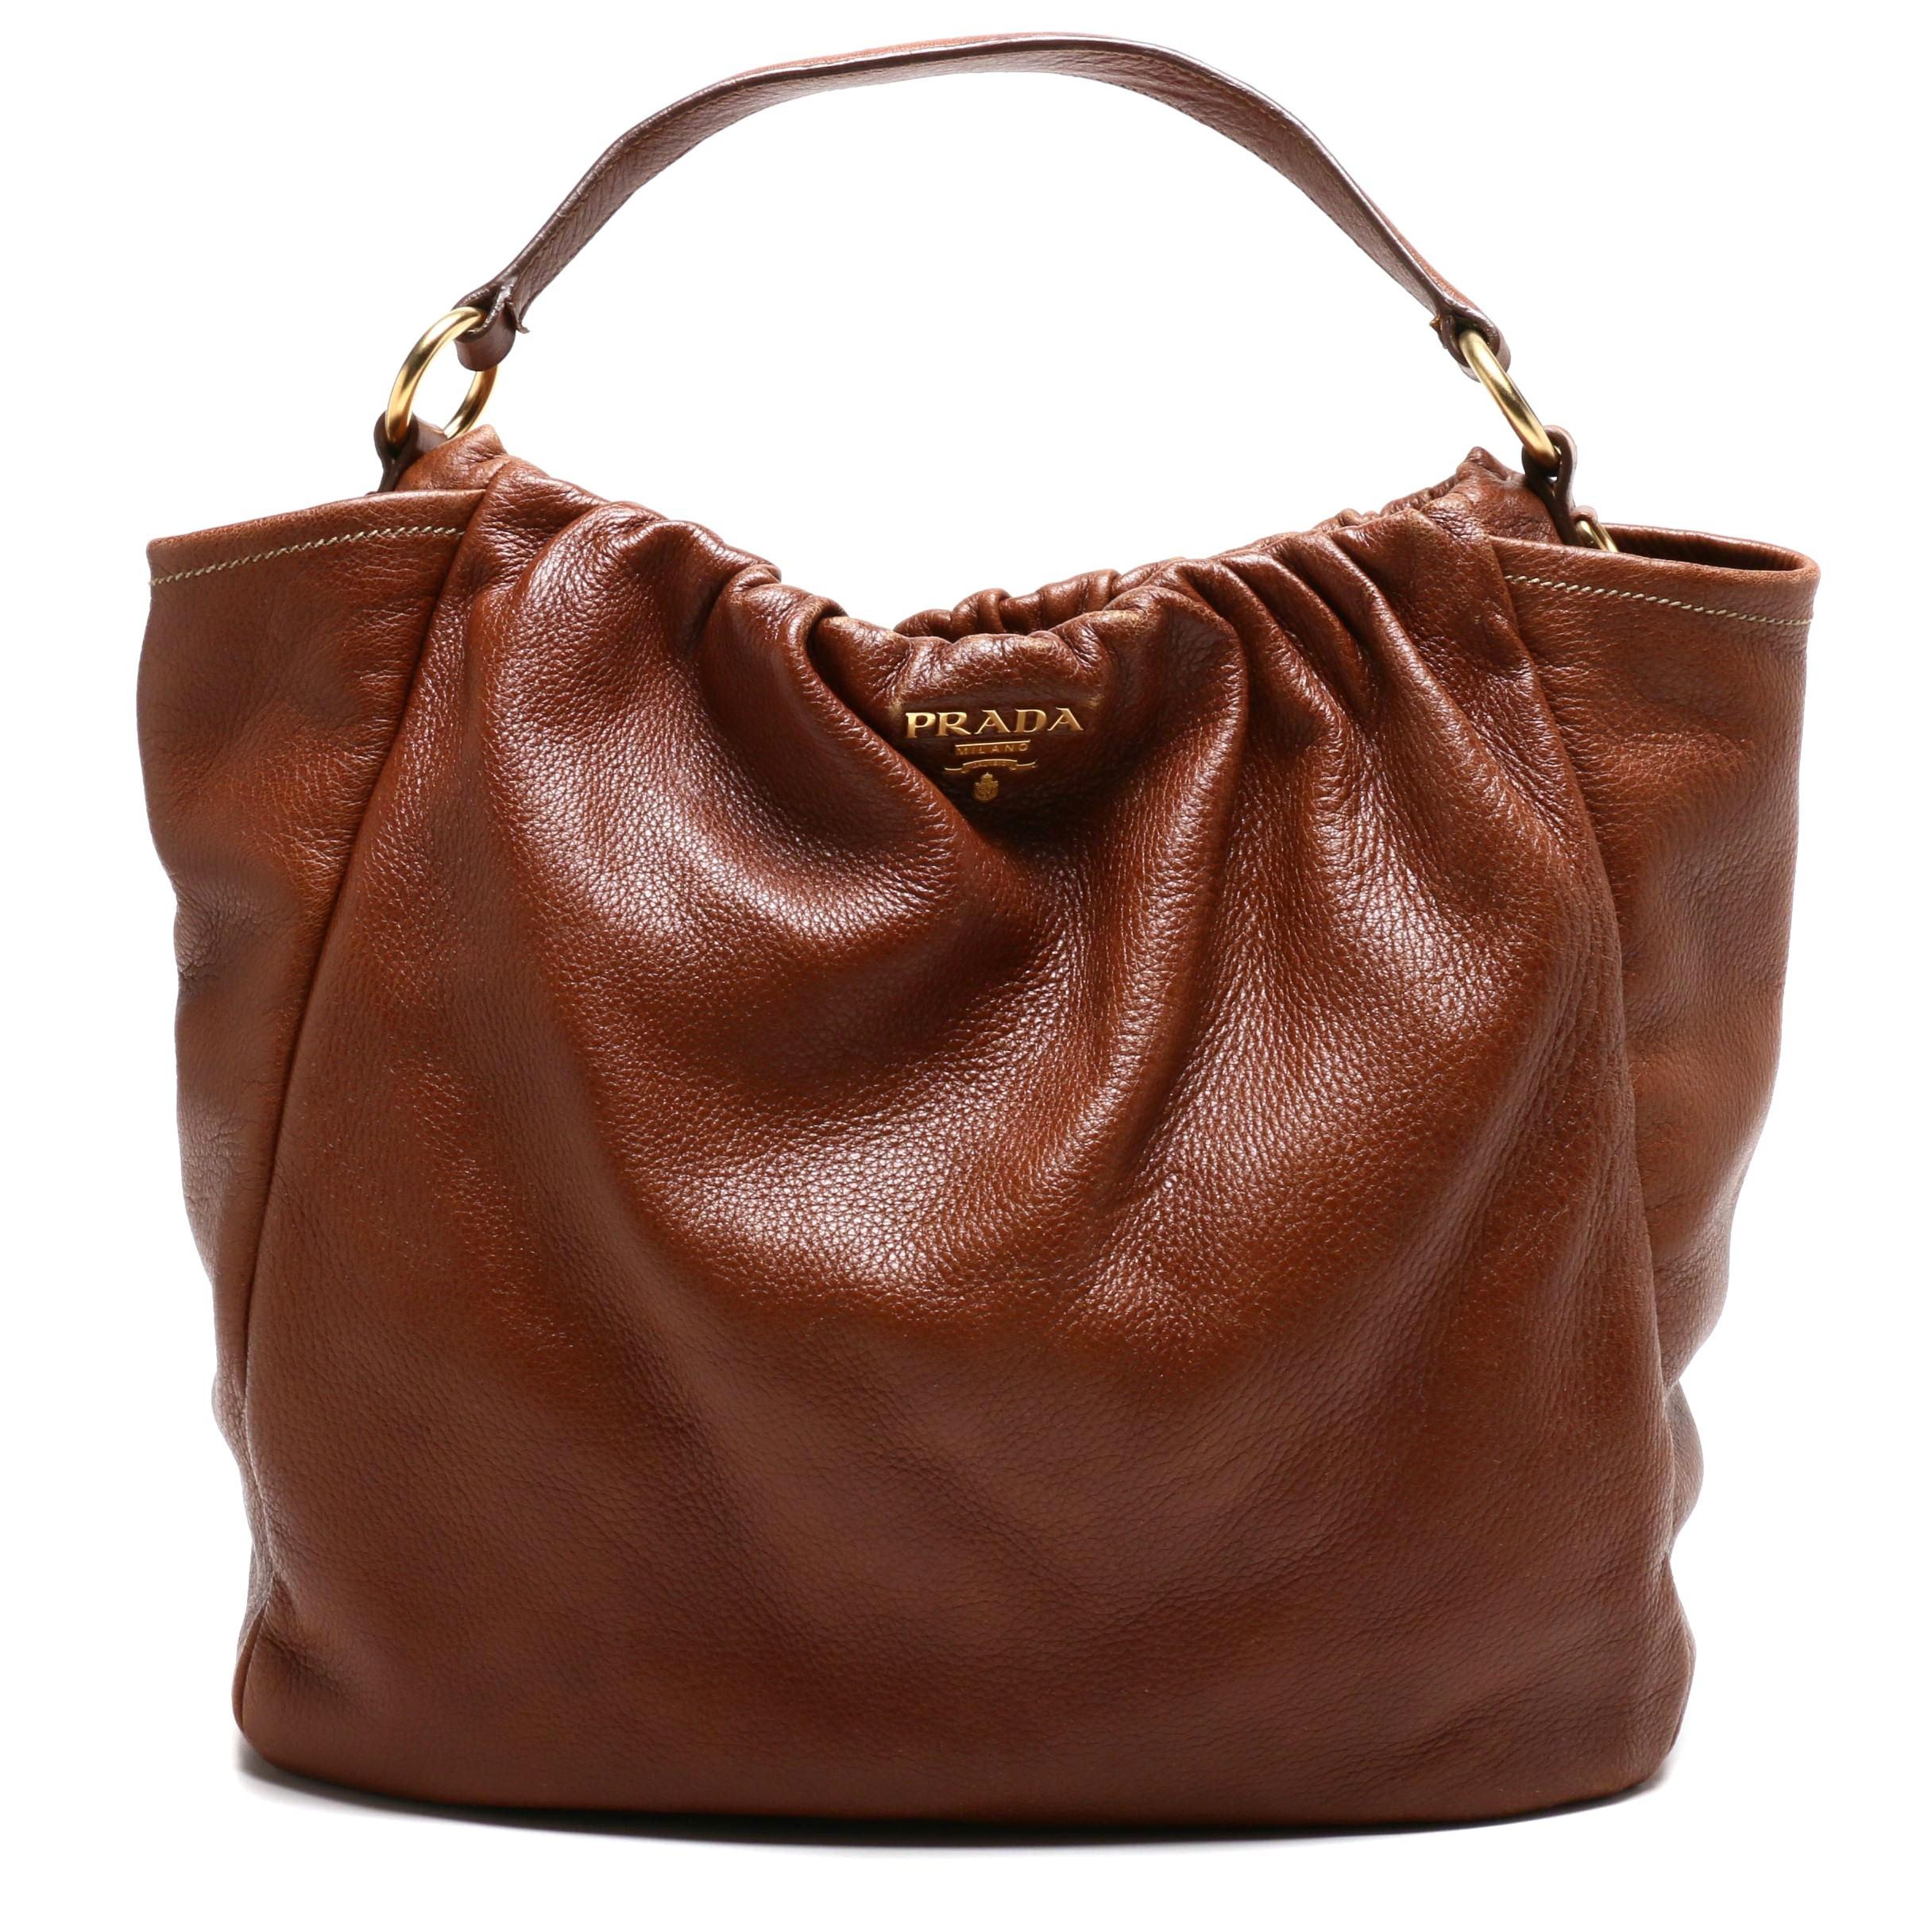 Prada Brown Vitello Daino Leather Hobo Bag